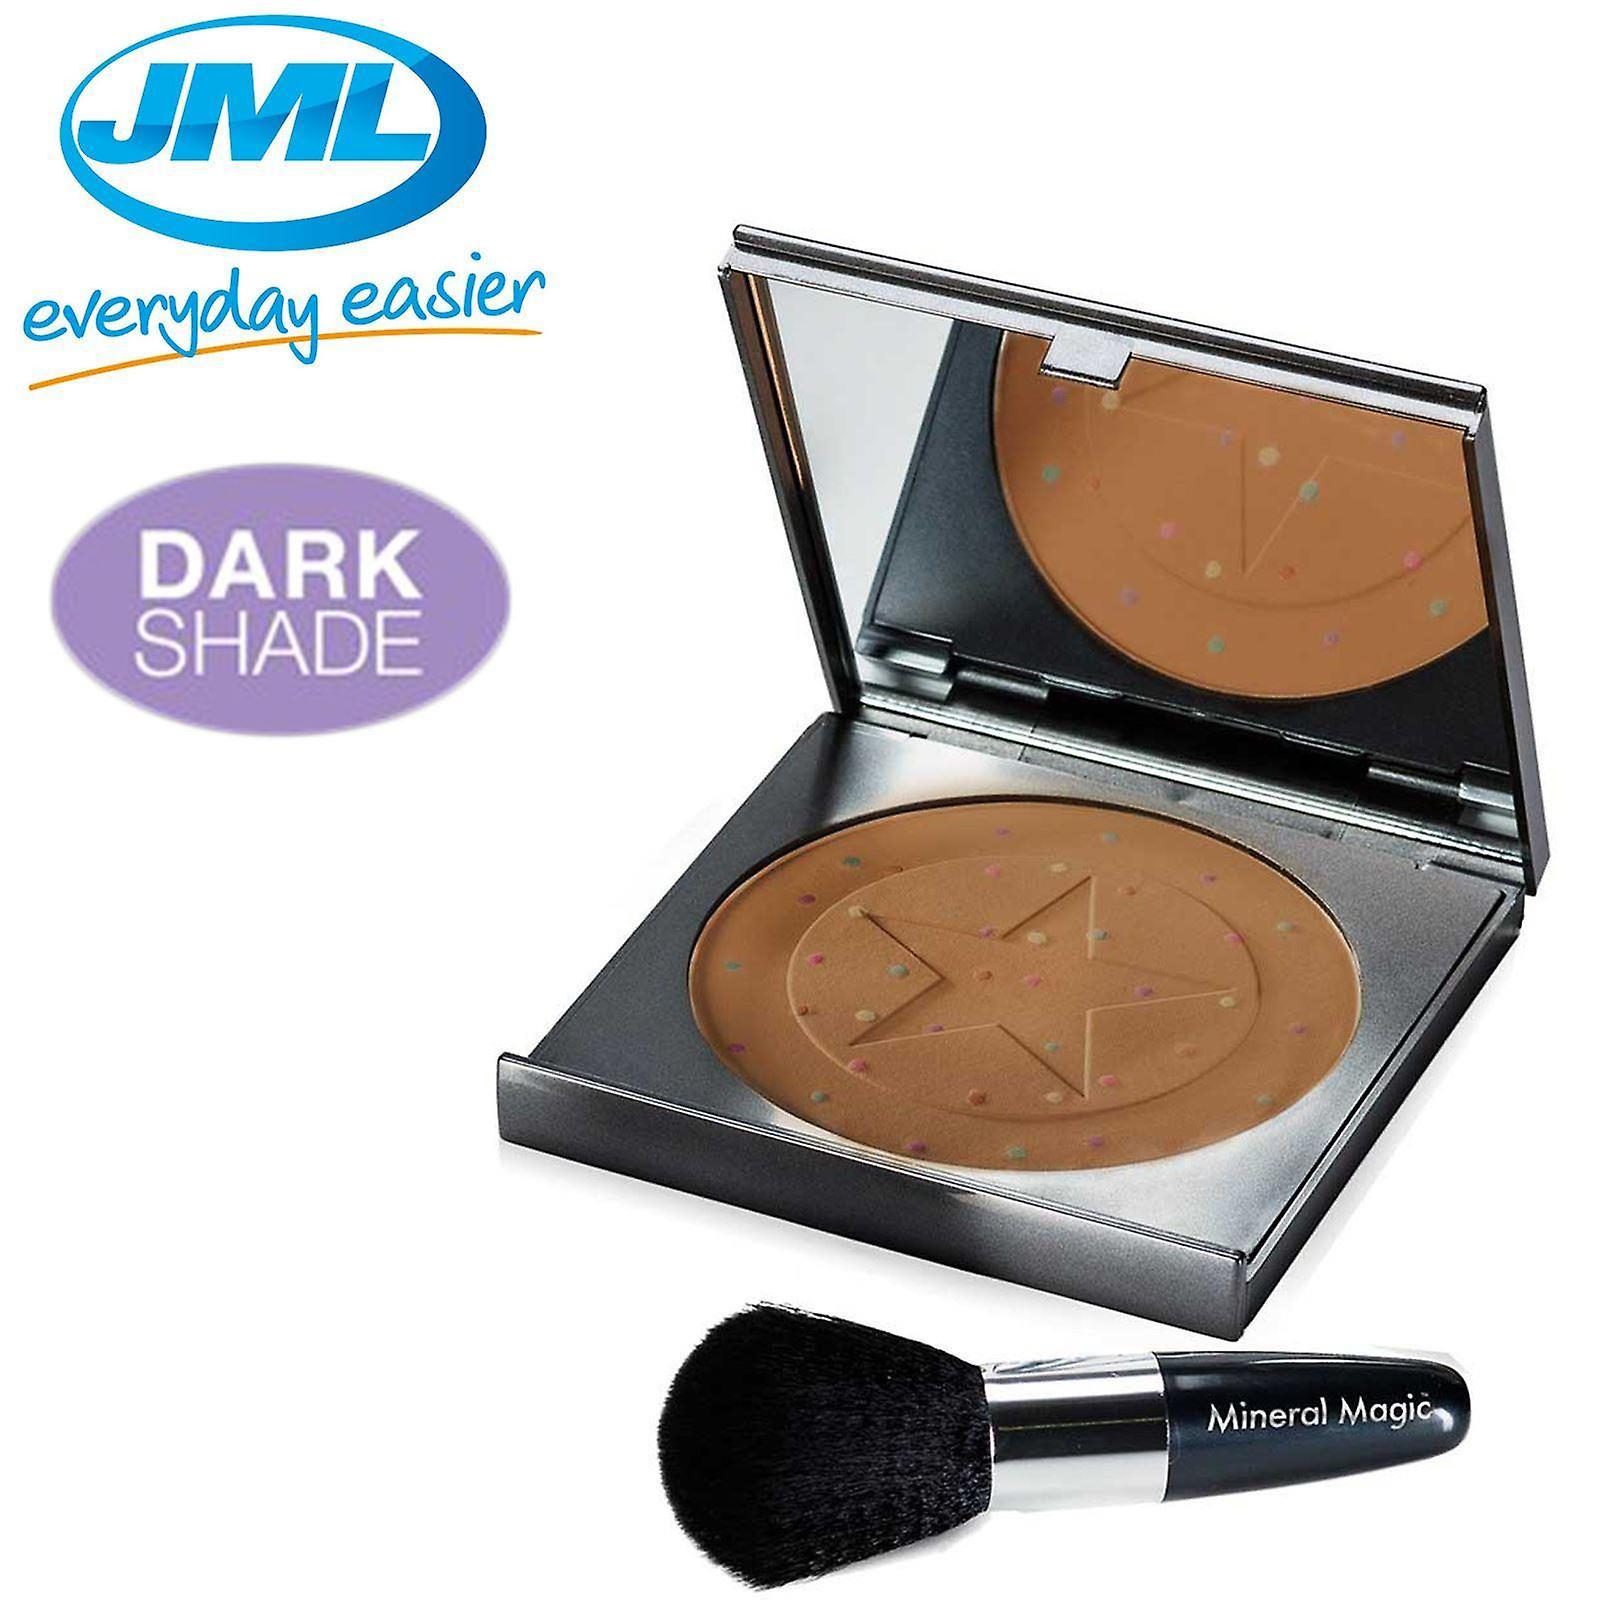 JML Mineral Magic Colour Correcting Powder - Dark Shade